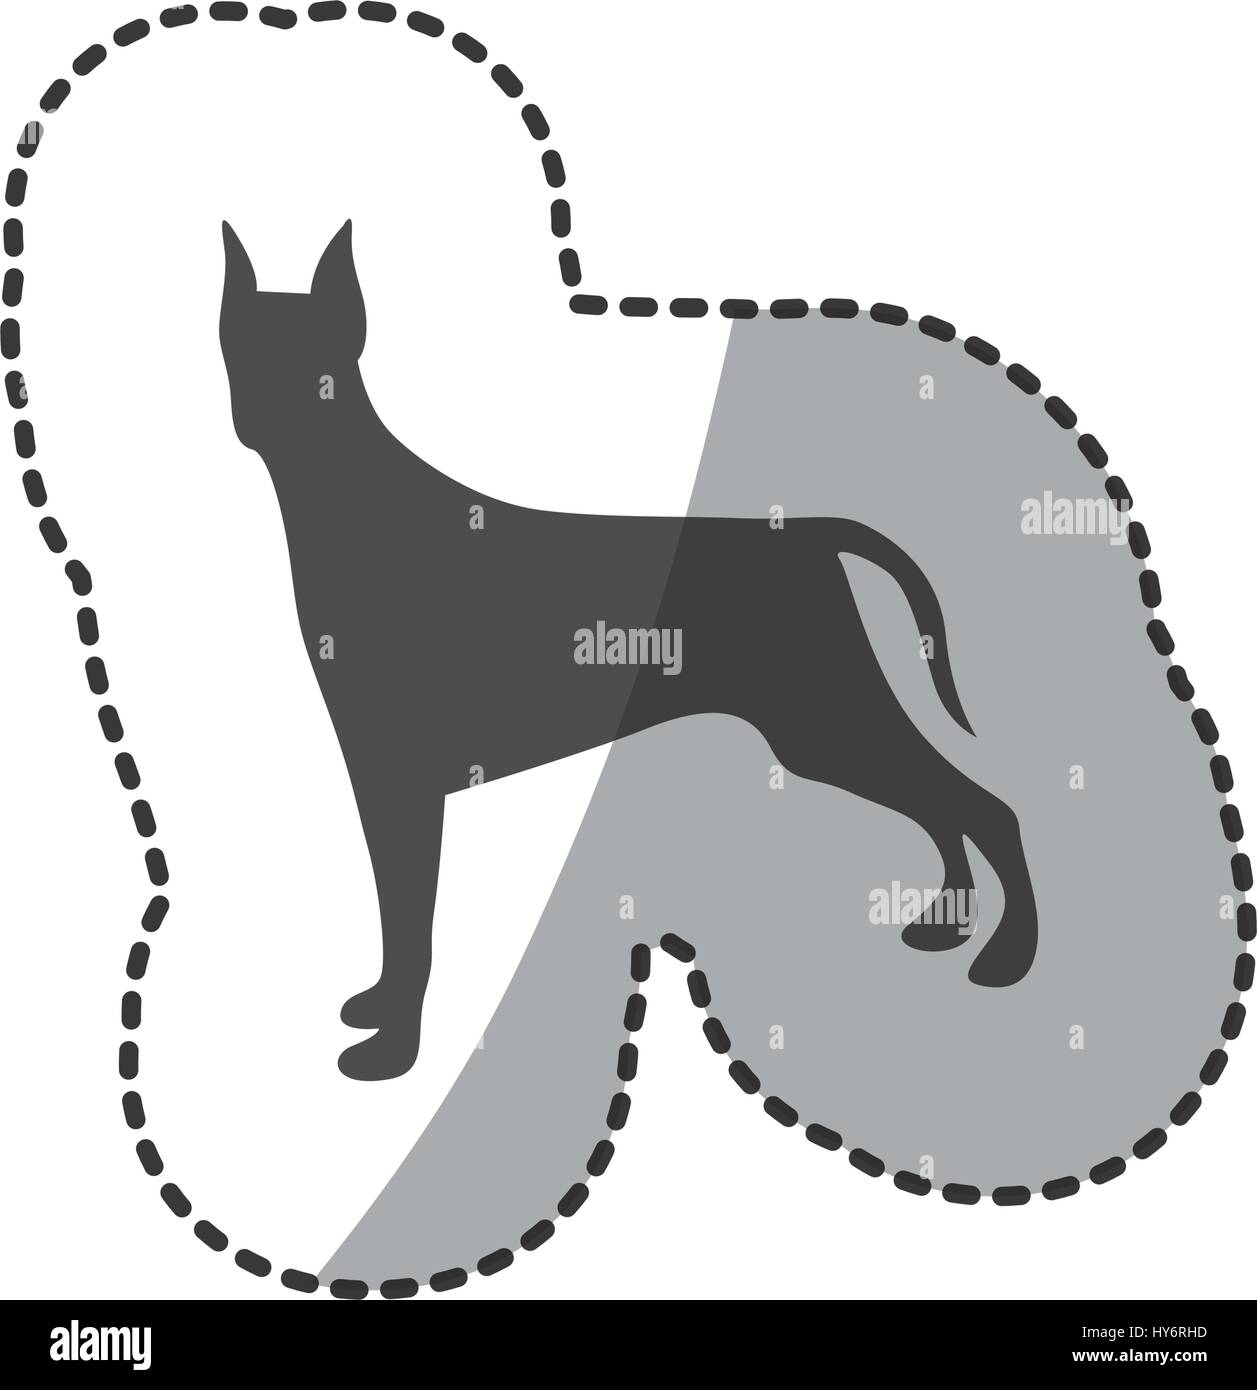 sticker silhouette cute dog animal - Stock Image